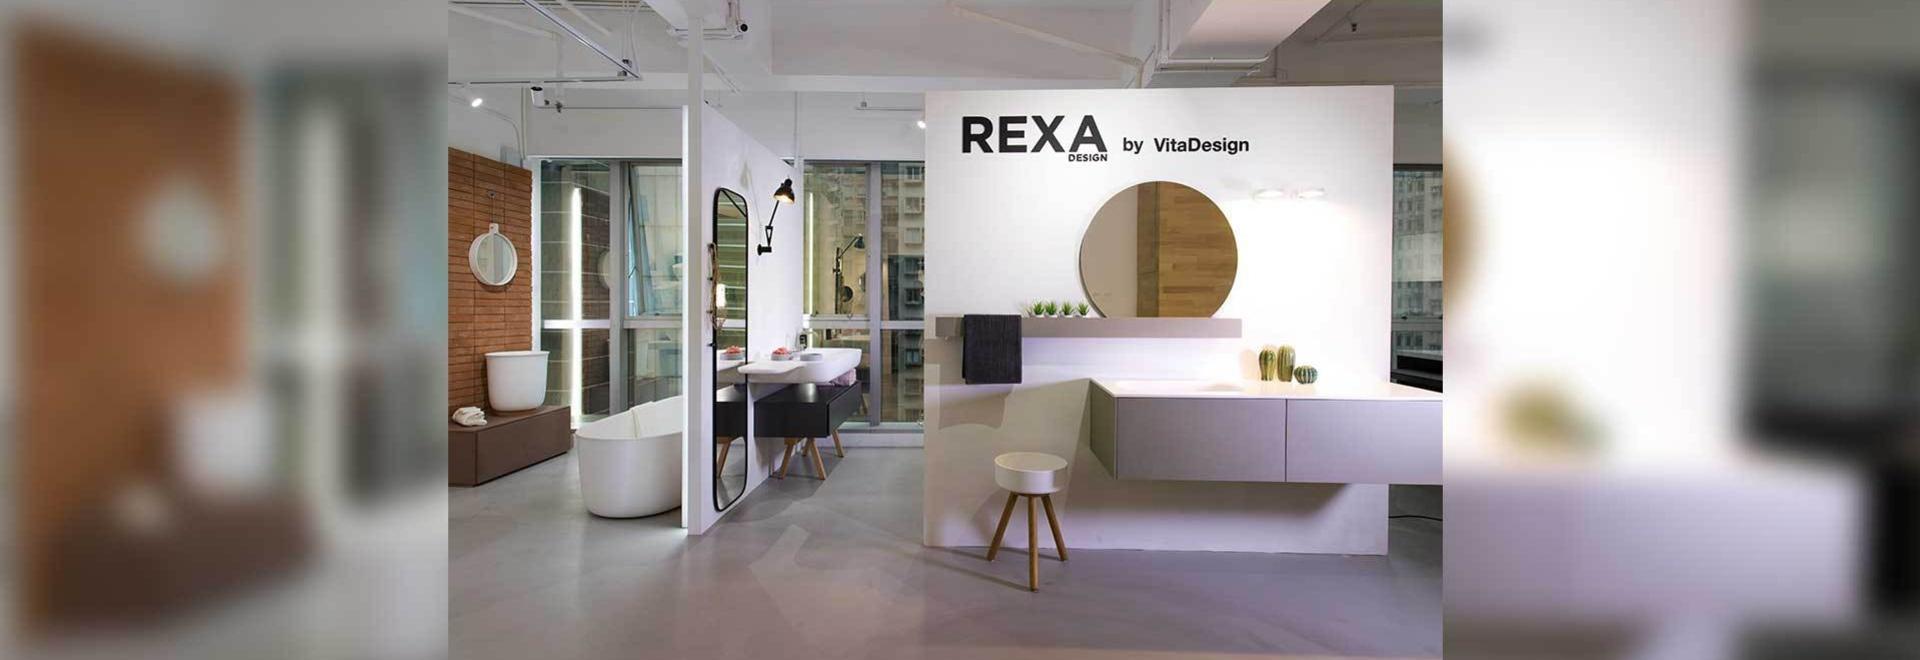 Rexa Flagship Store - Vita Design, Hong Kong